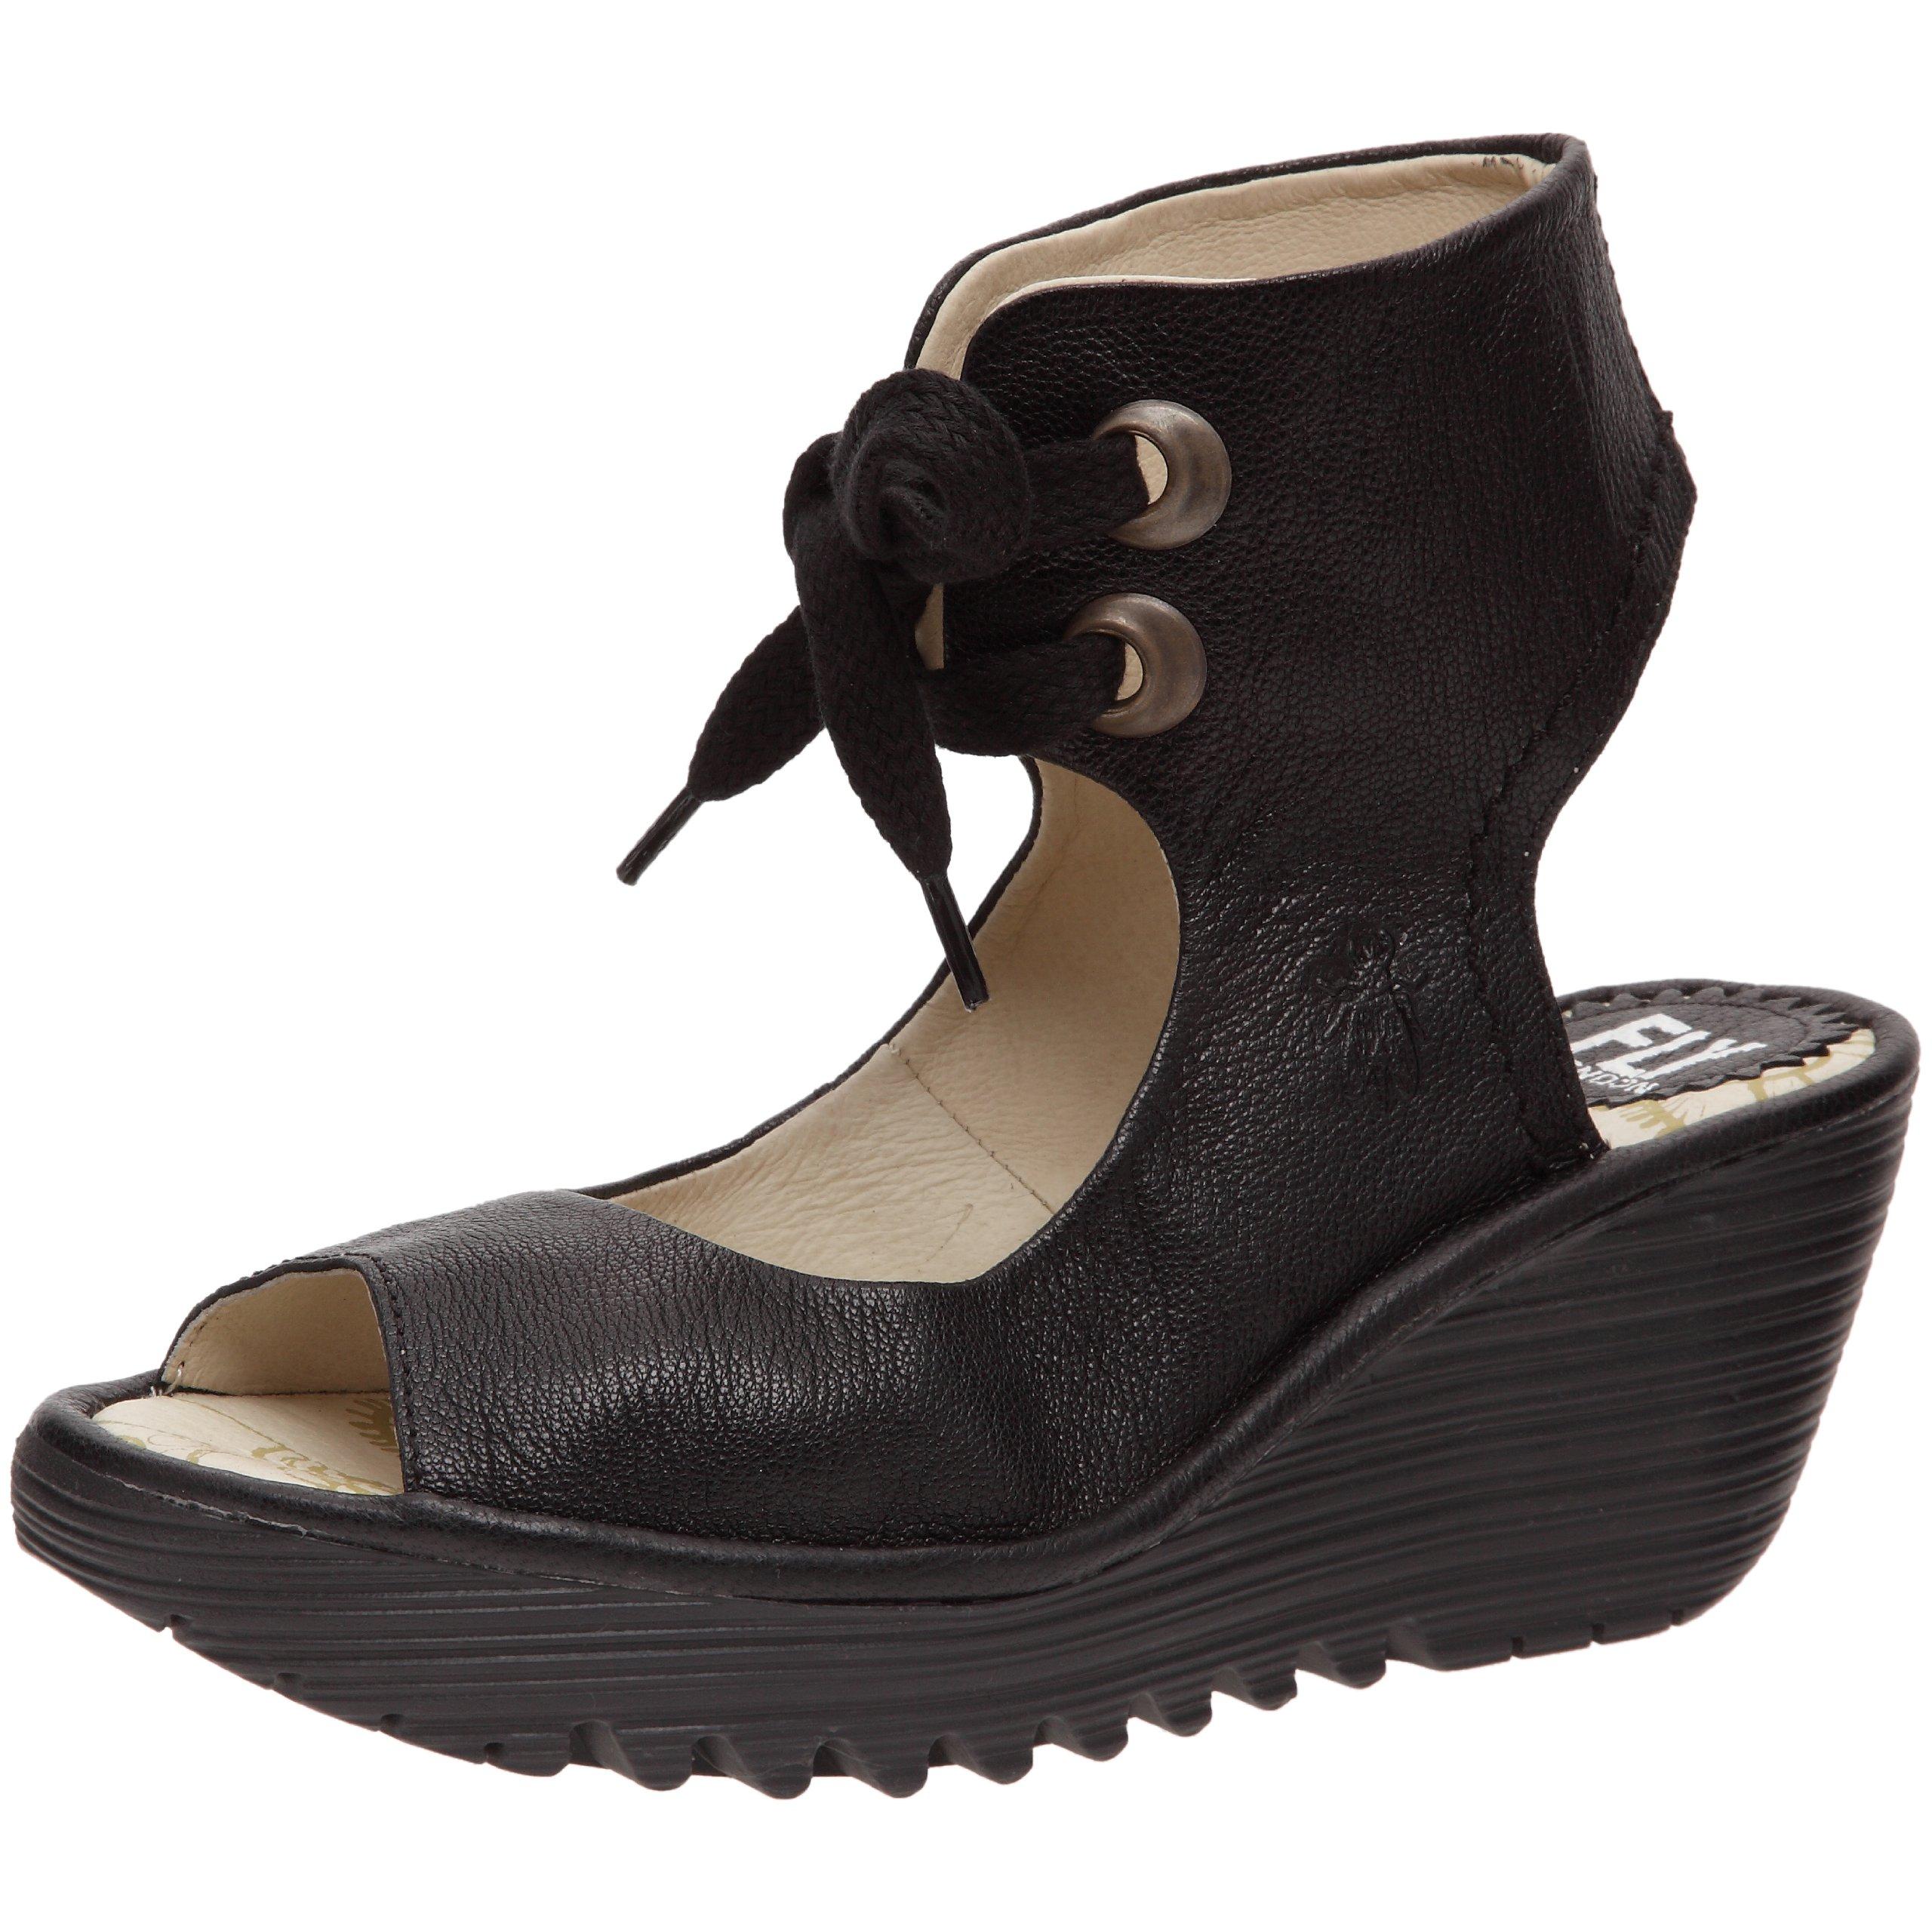 Fly London Women's Yaffa Ankle Strap Wedge,Black MoUSse,39 EU/8 M US